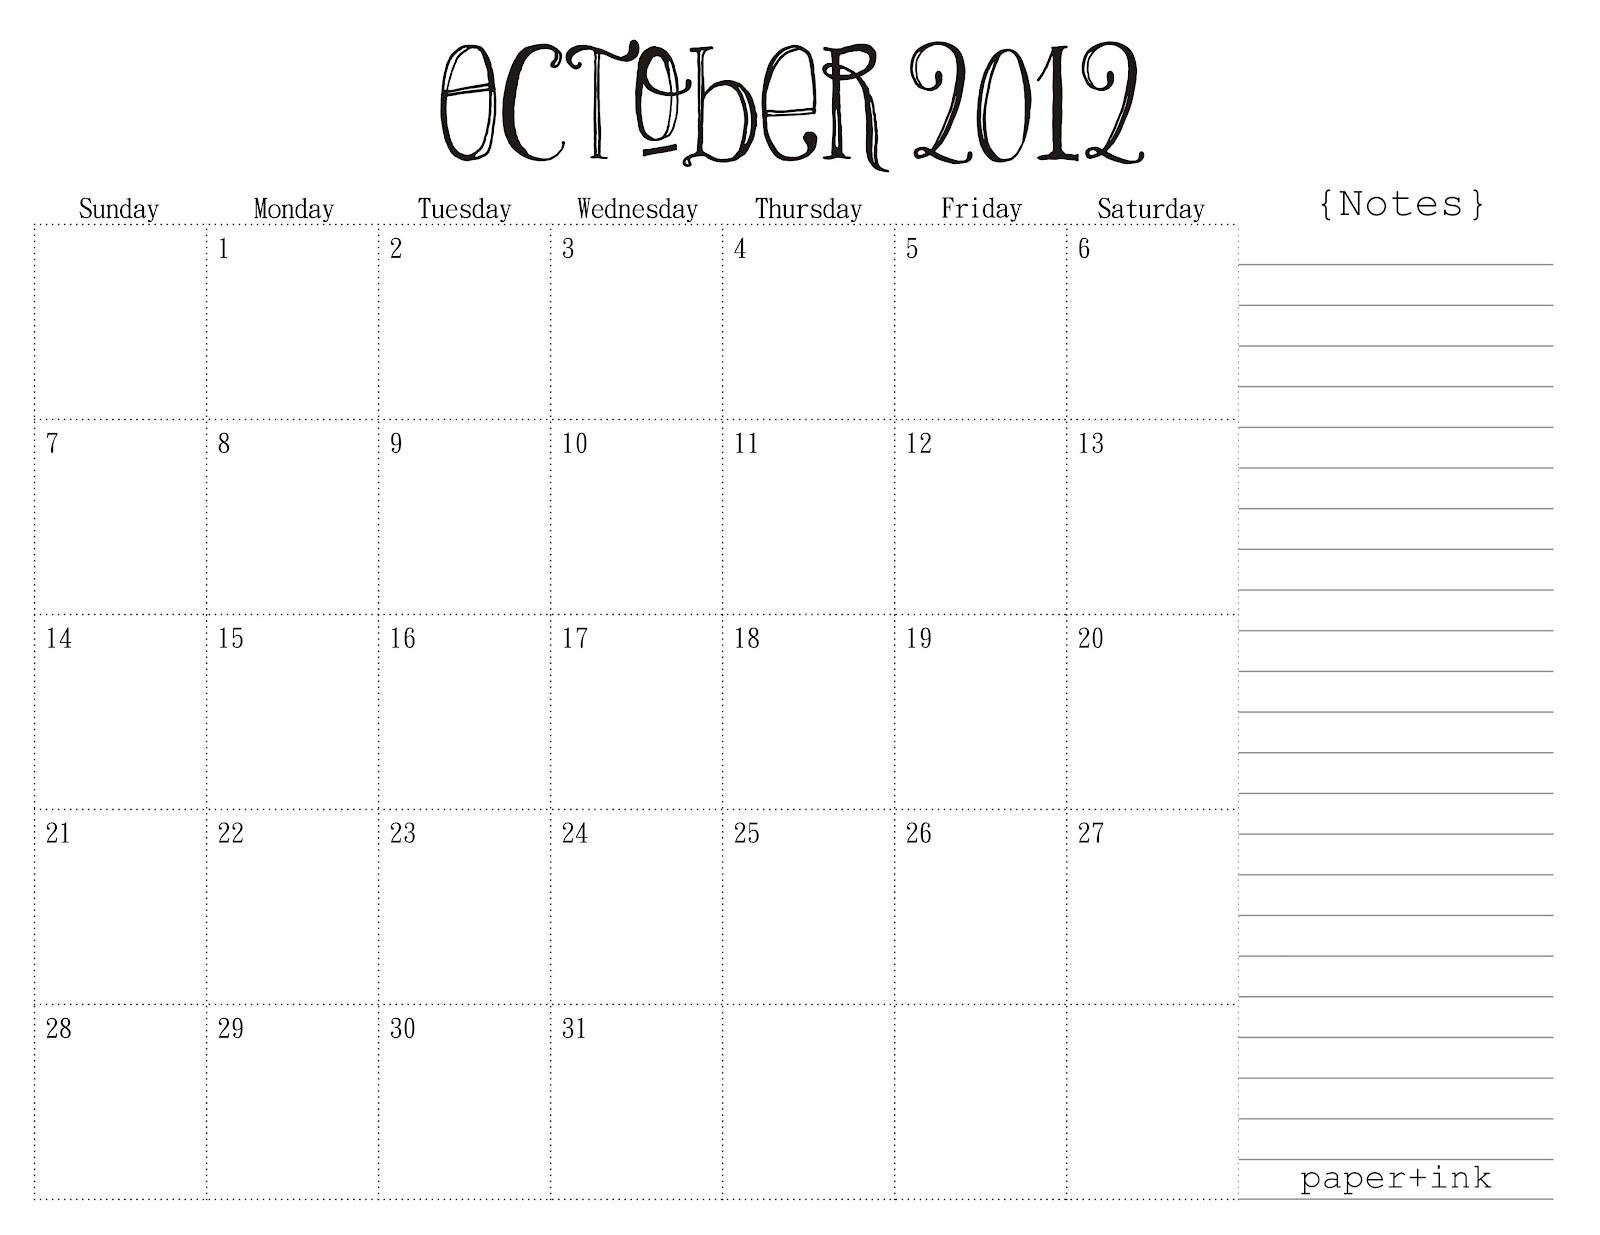 Free Printable Calendars - October 2012